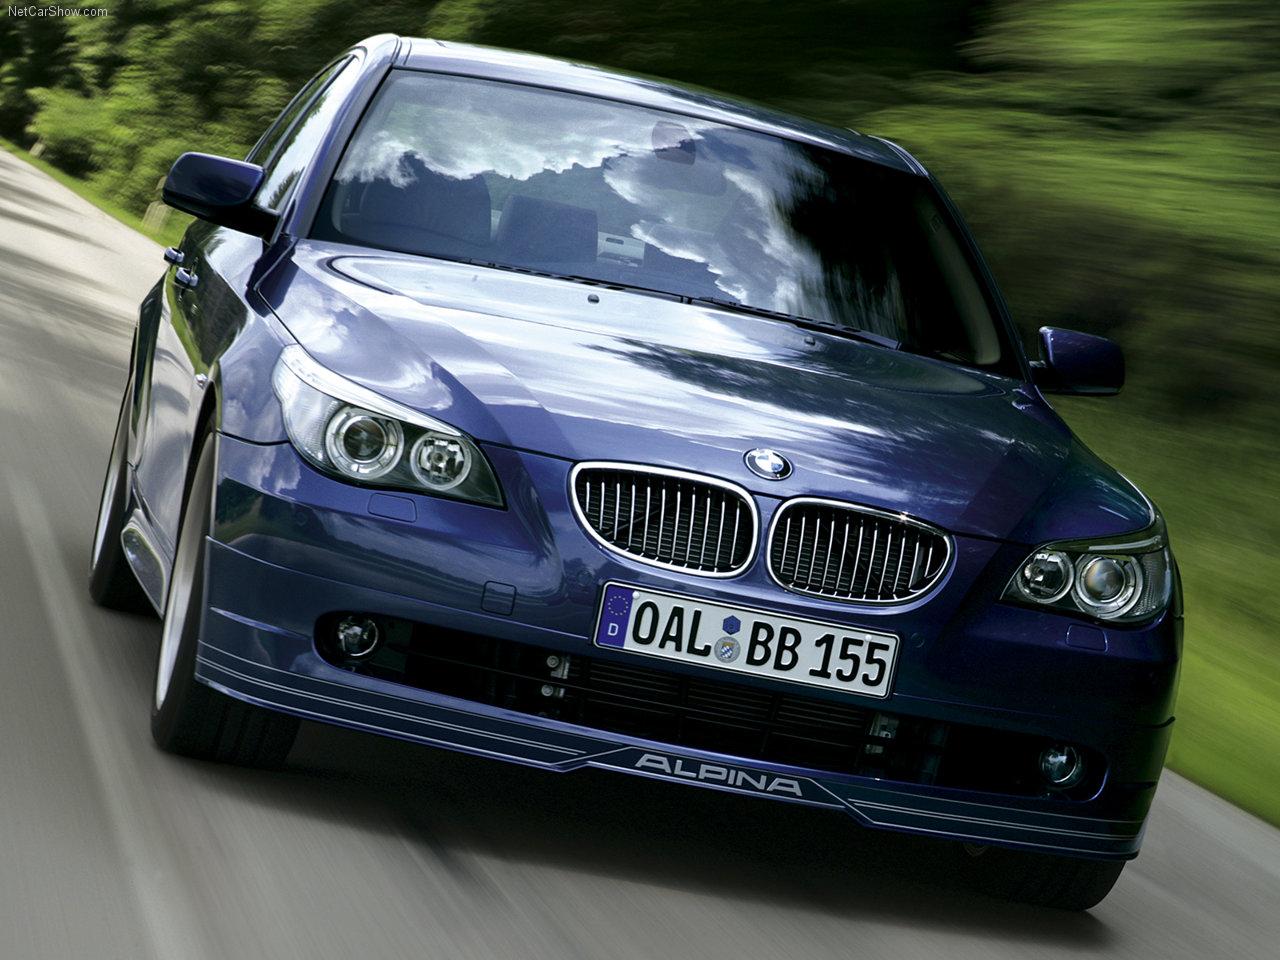 Alpina BMW B5 2006 Alpina-BMW_B5-2006-1280-02